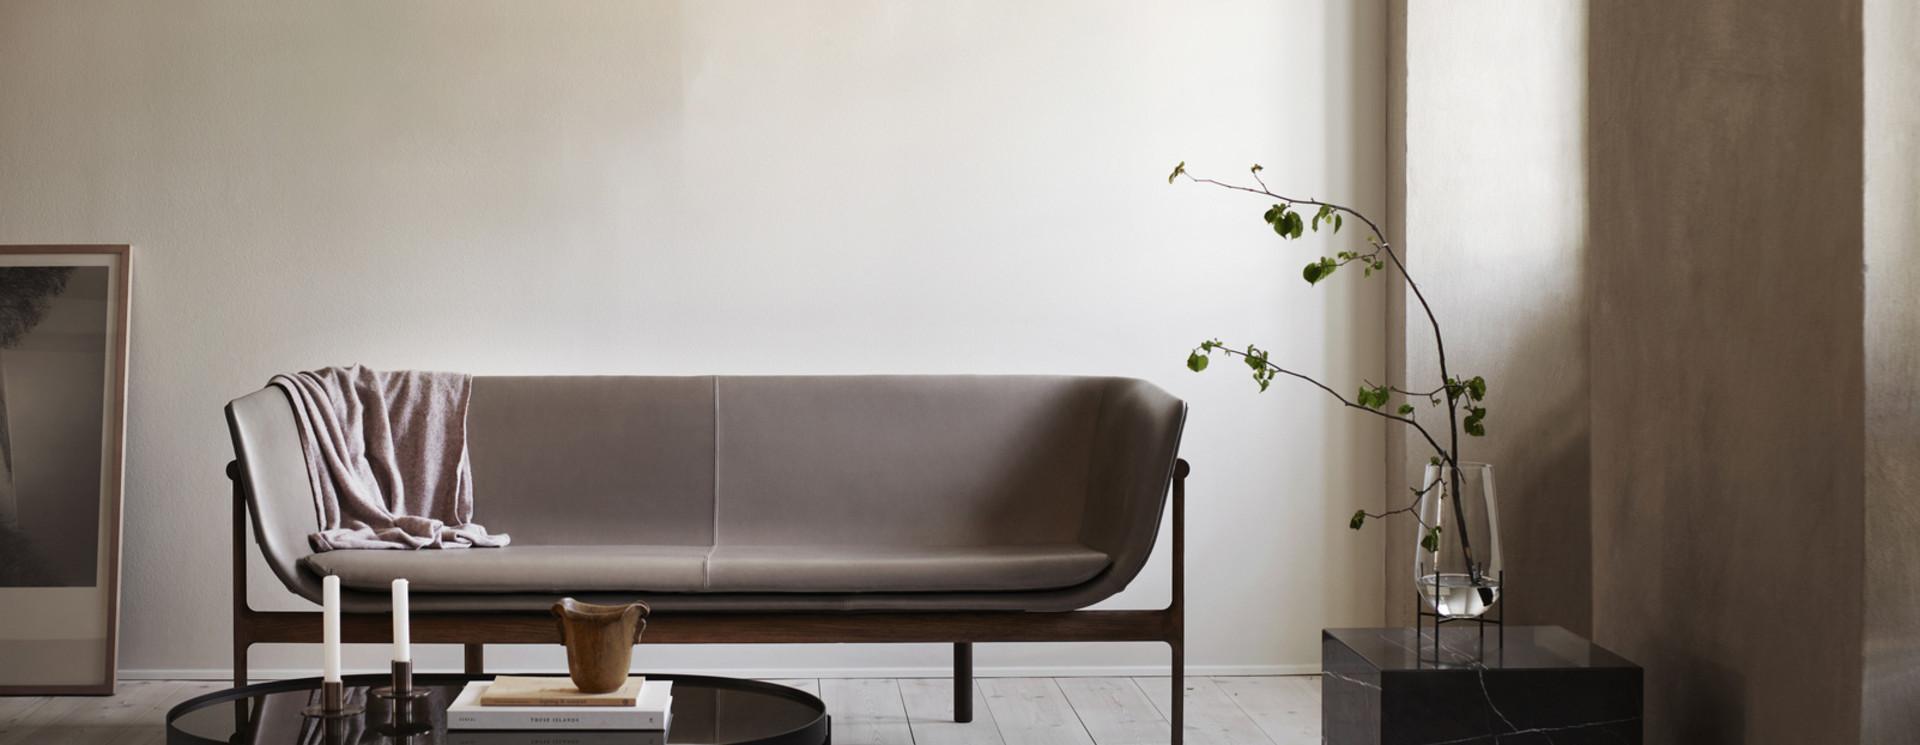 Sofa' s